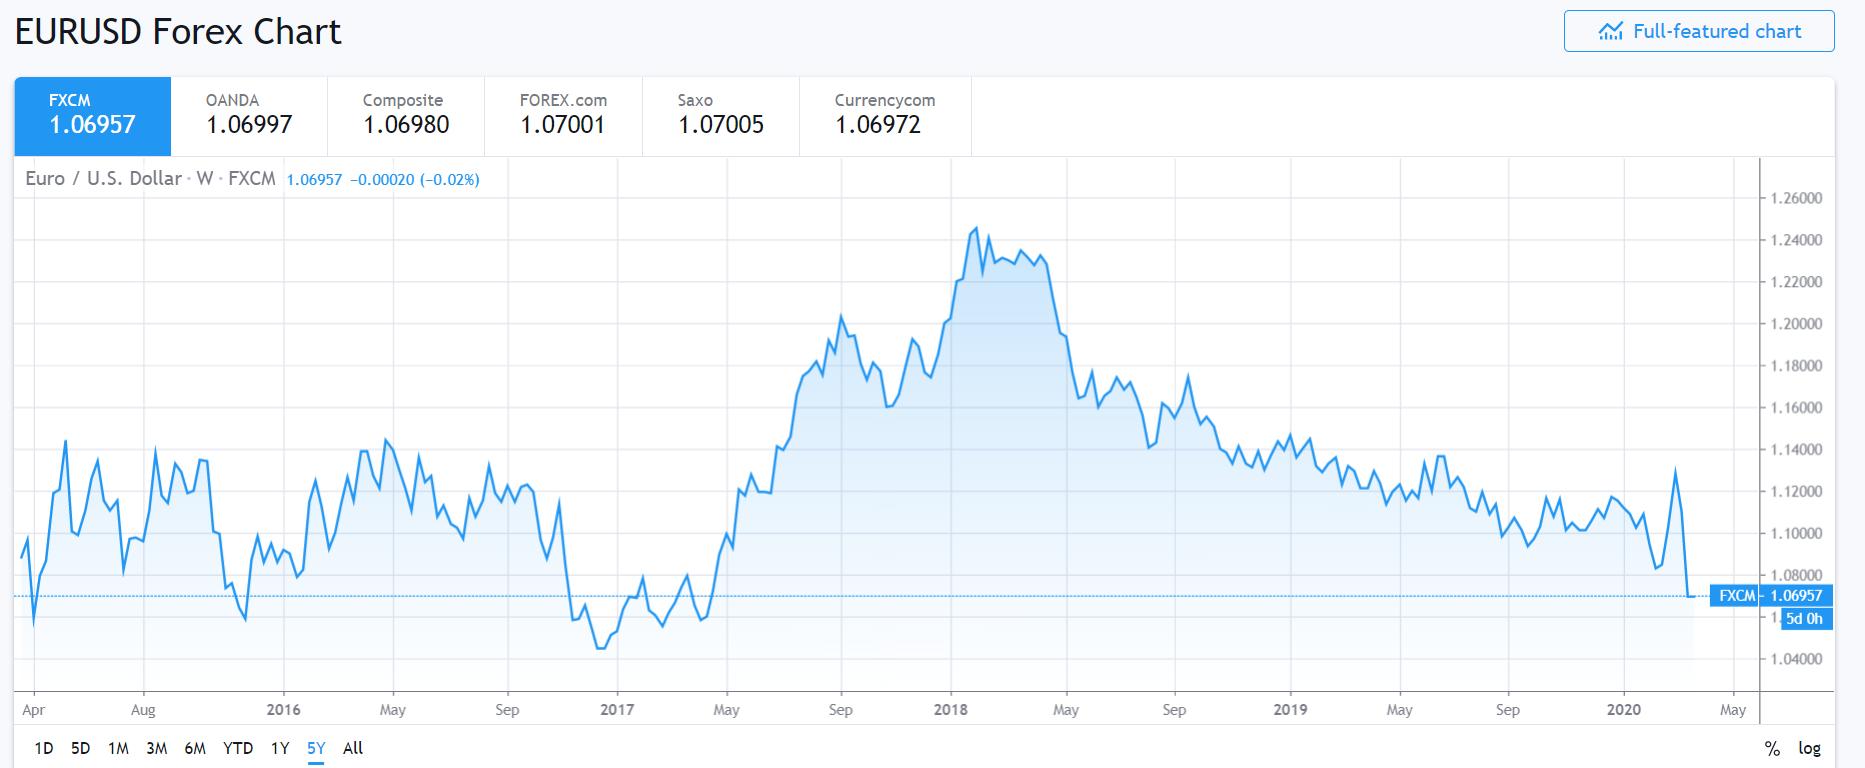 EURUSD 5Y Chart - Daily FX - 23 March 2020